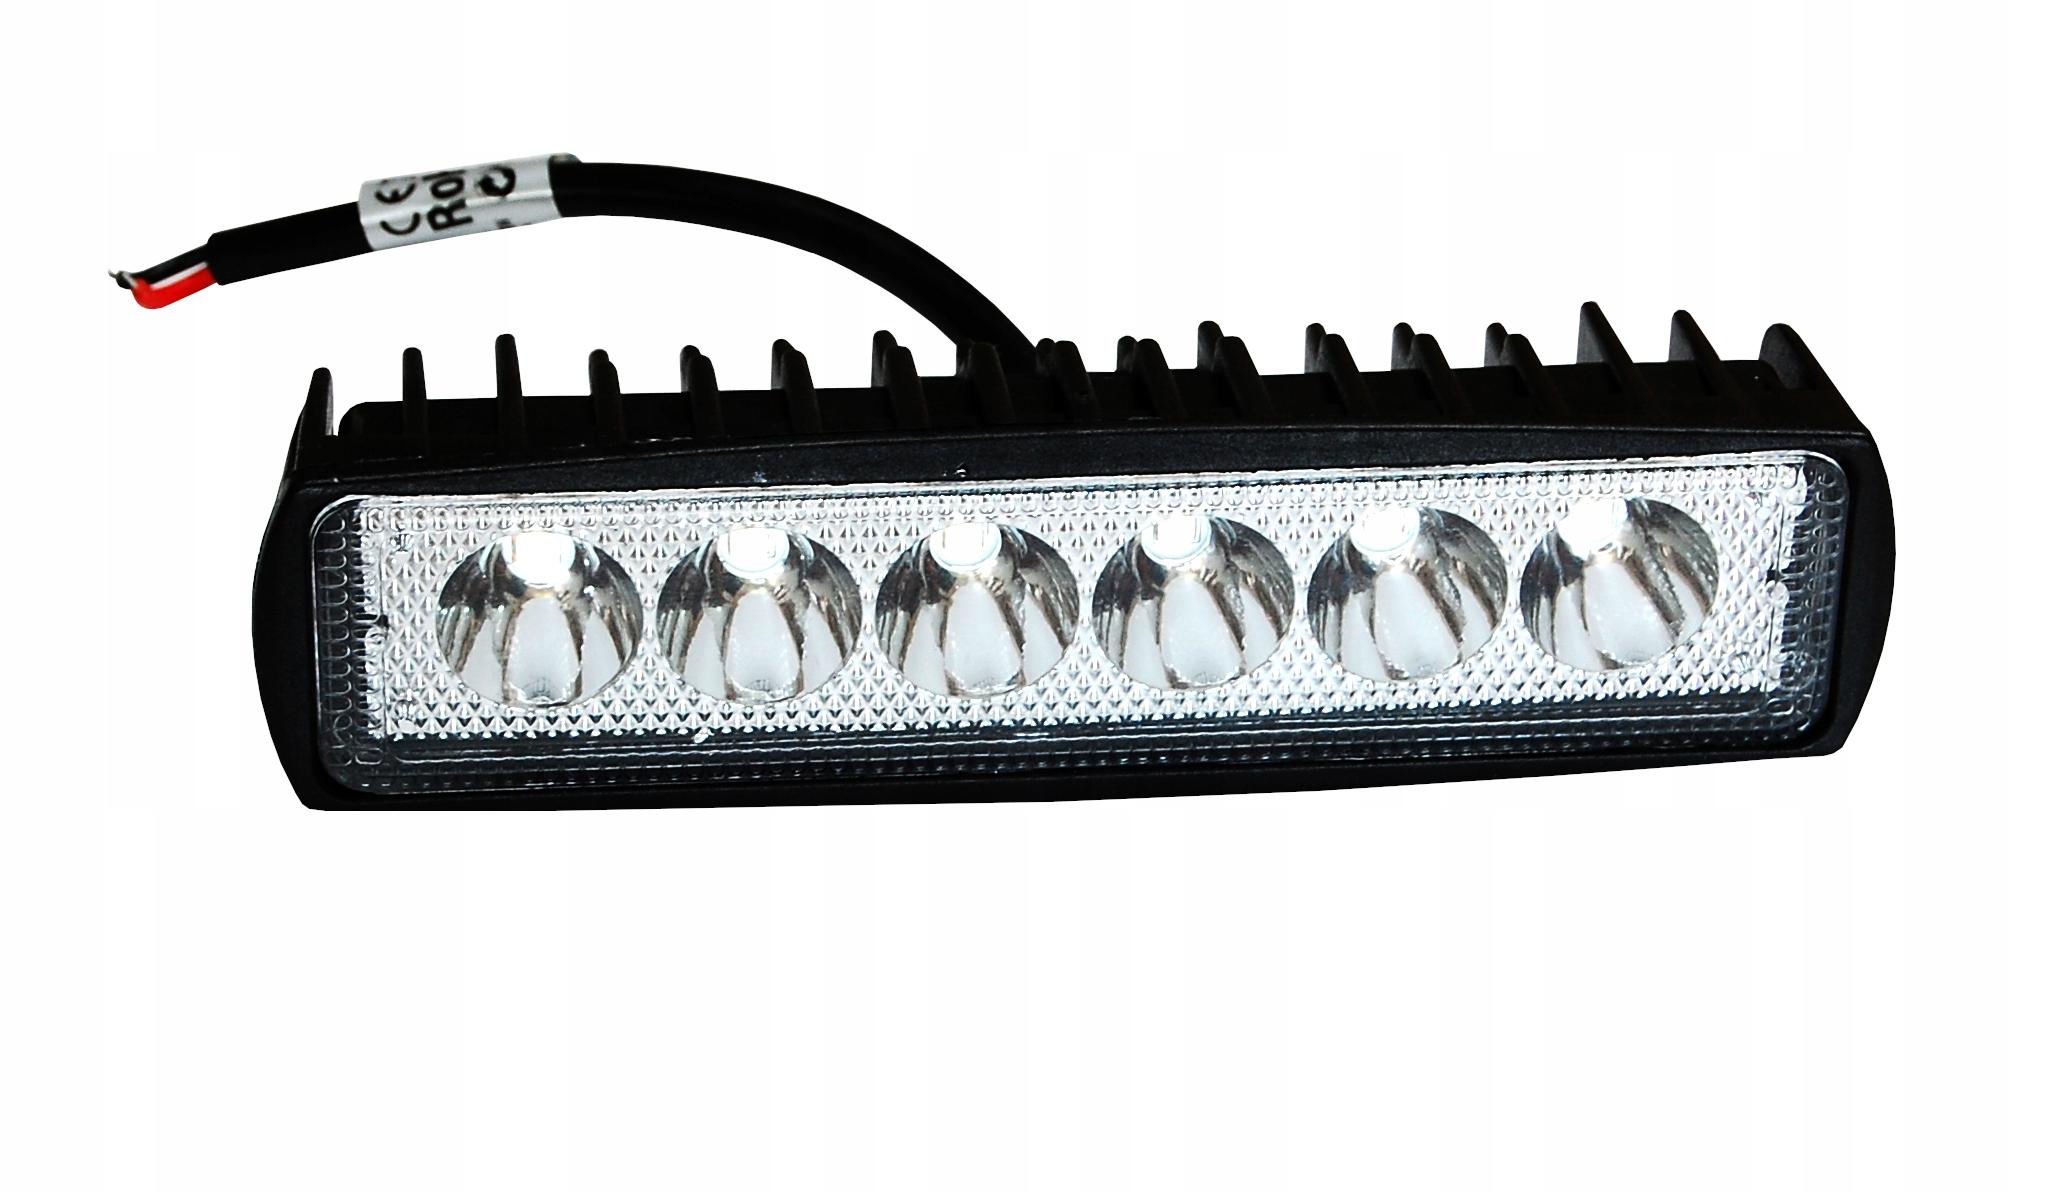 LAMPA ROBOCZA 6 LED halogen 18W 12-24V SZPERACZ